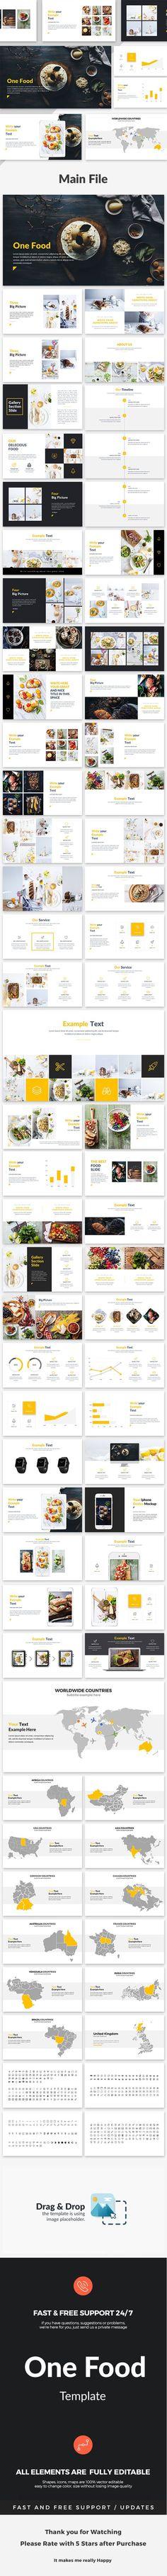 50 Ideas For Design Layout Food Creative Web Design, Slide Design, Page Design, Book Design, Layout Design, Keynote Design, Brochure Design, Photo Images, Presentation Layout